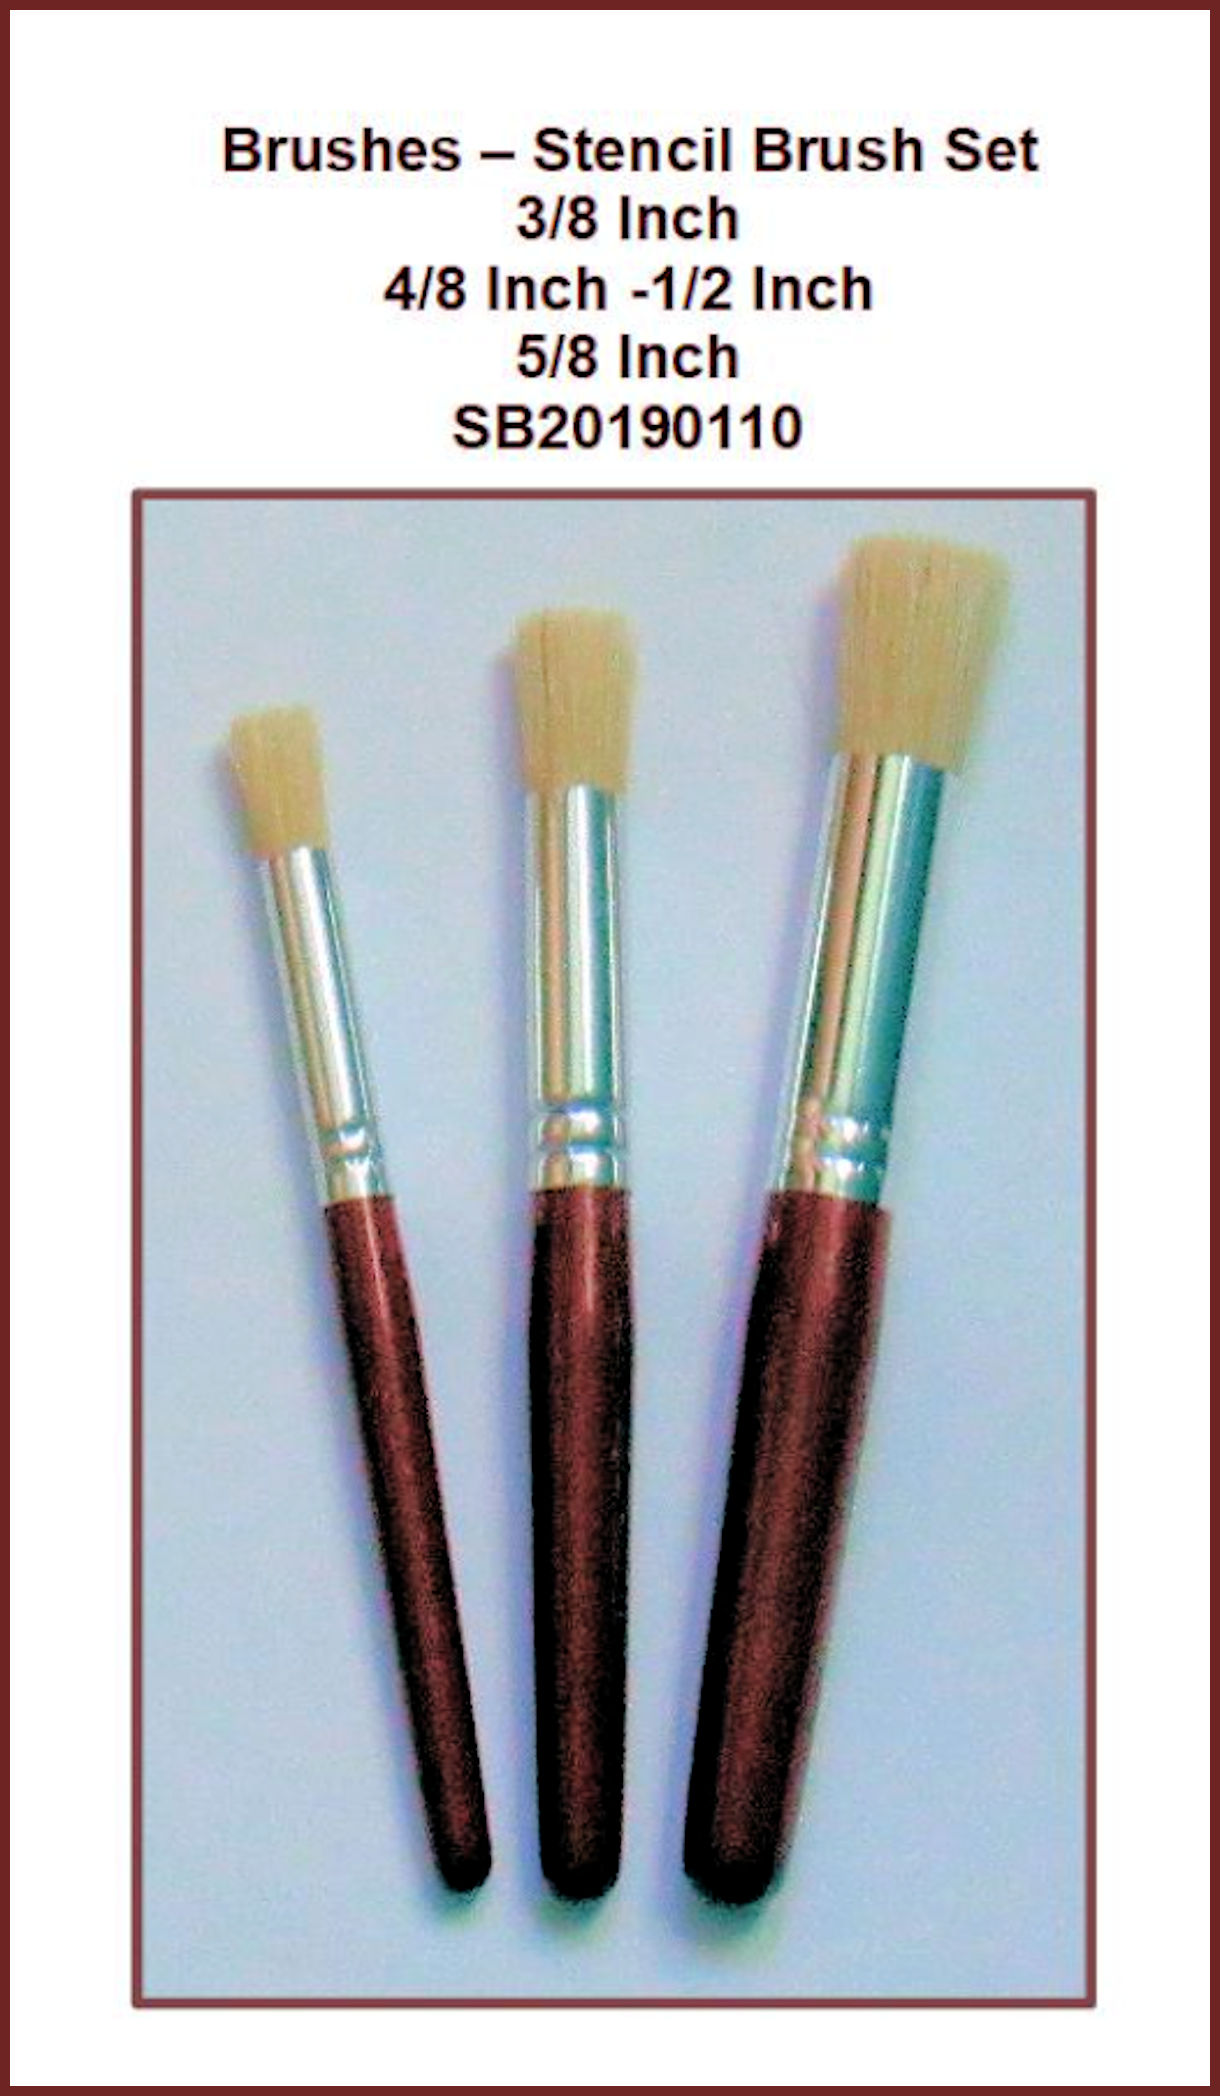 brushes-stencil-brush-set-sb20190110-boarder.jpg